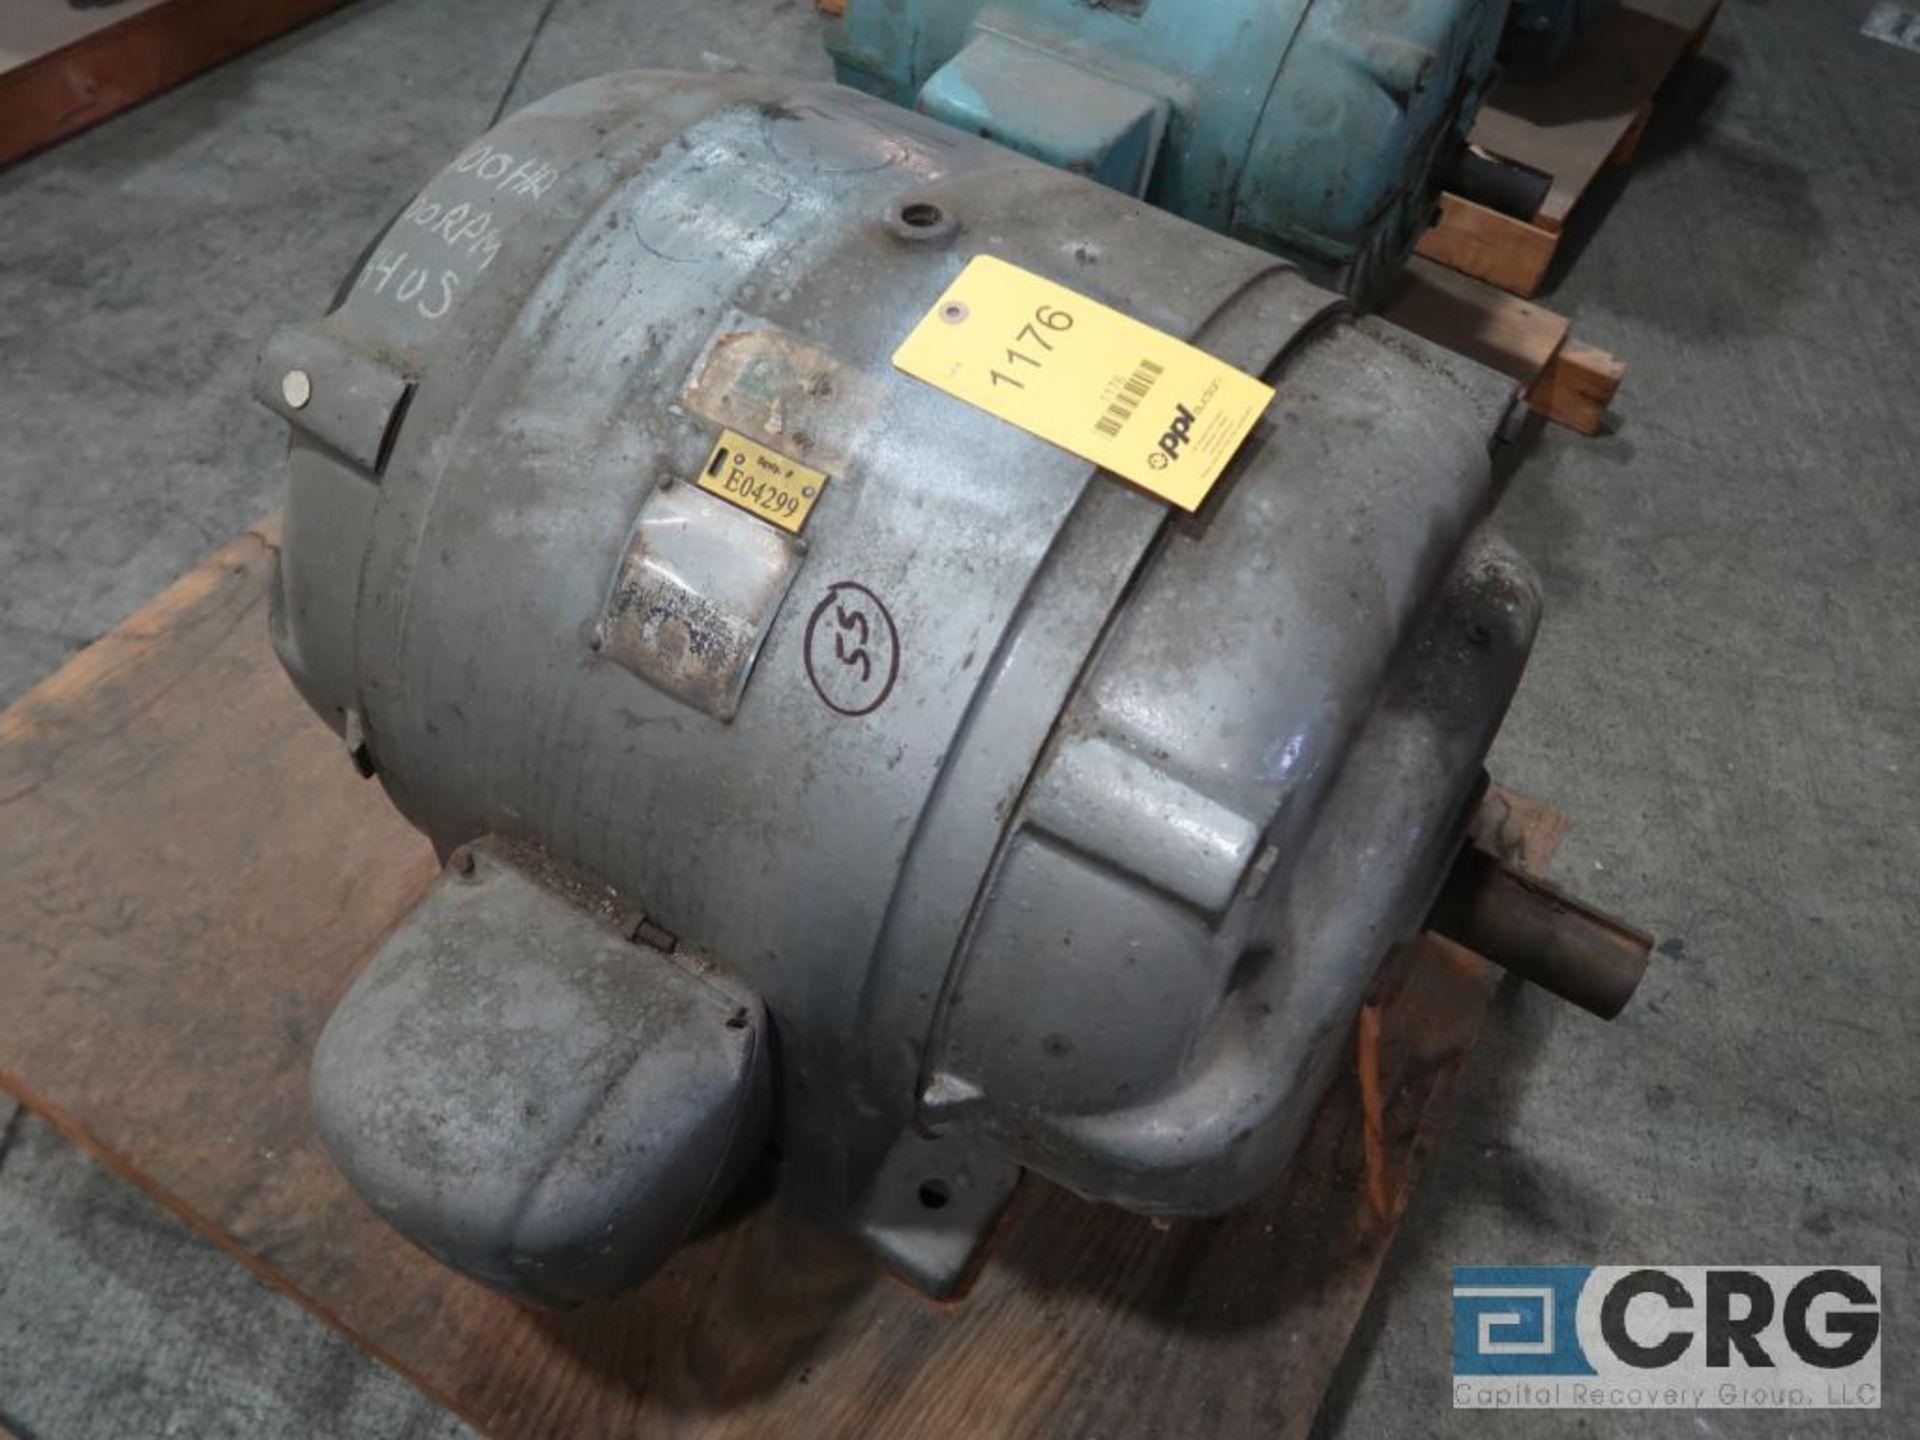 U.S. Electrical Uniclosed motor, 100 HP, 1,800 RPMs, 220/440 volt, 3 ph., 444US frame (Finish